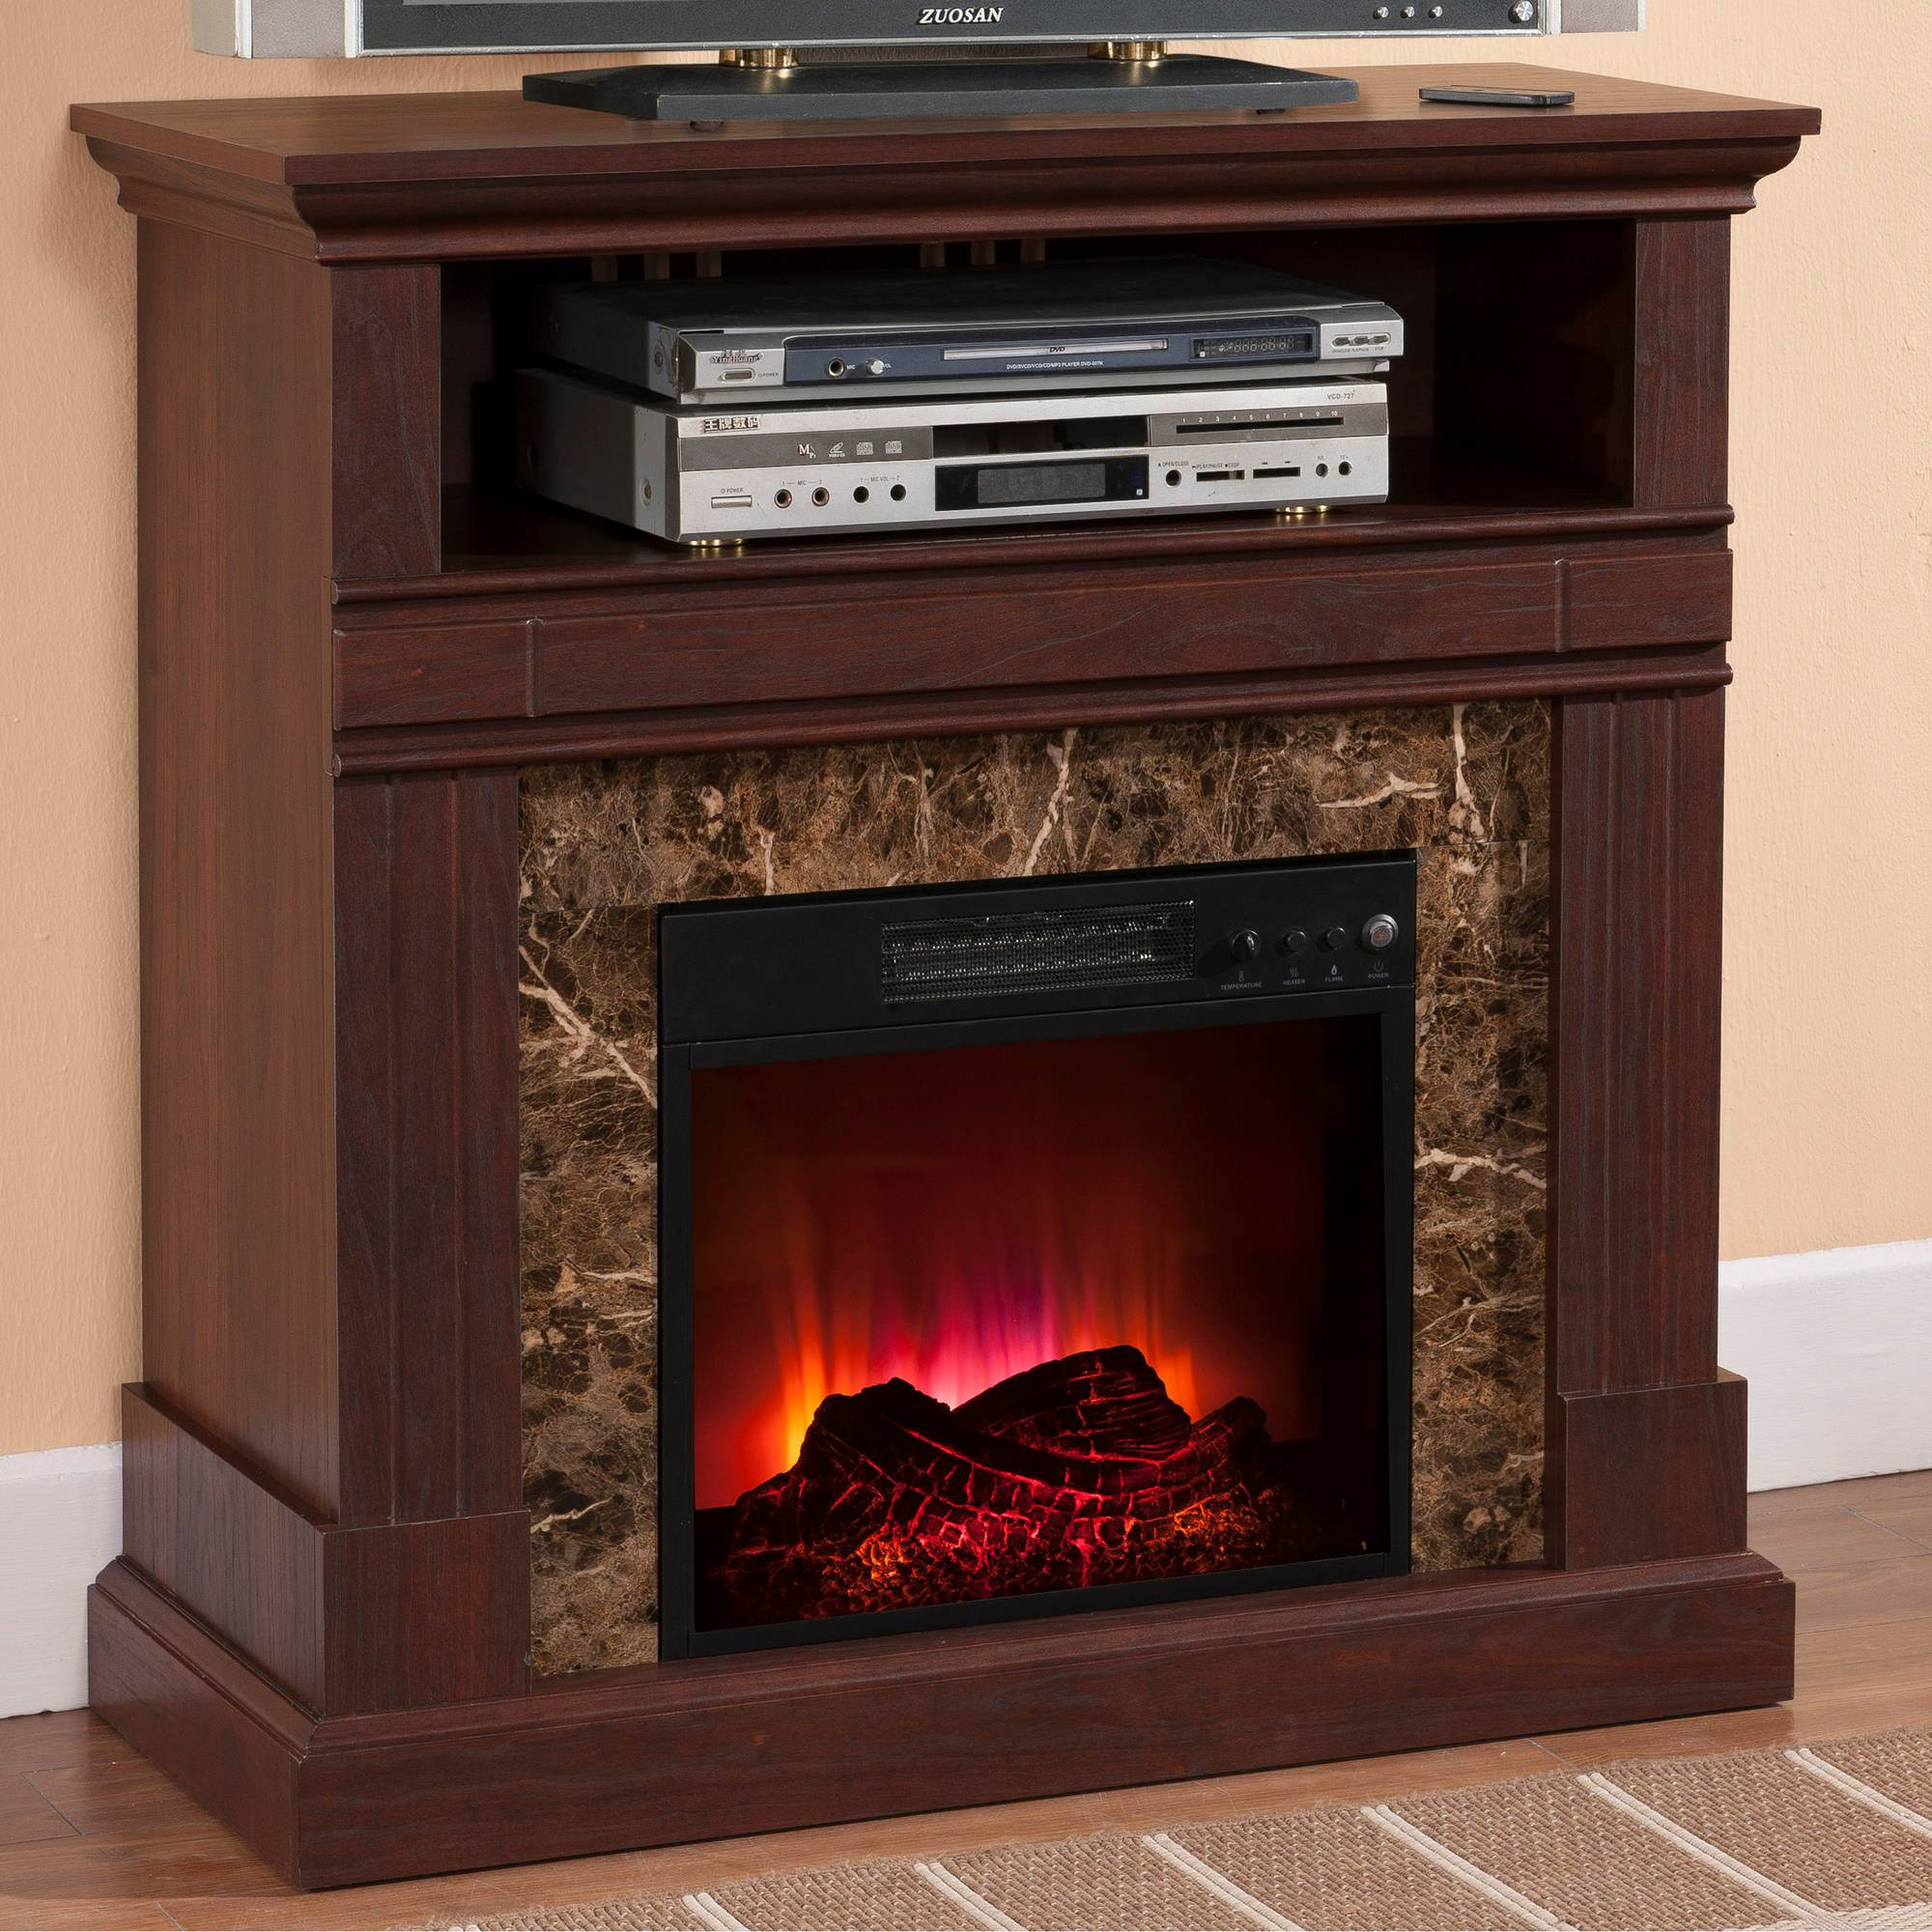 Black Corner Fireplace Tv Stand Best Of Corner Electric Fireplace Tv Stand